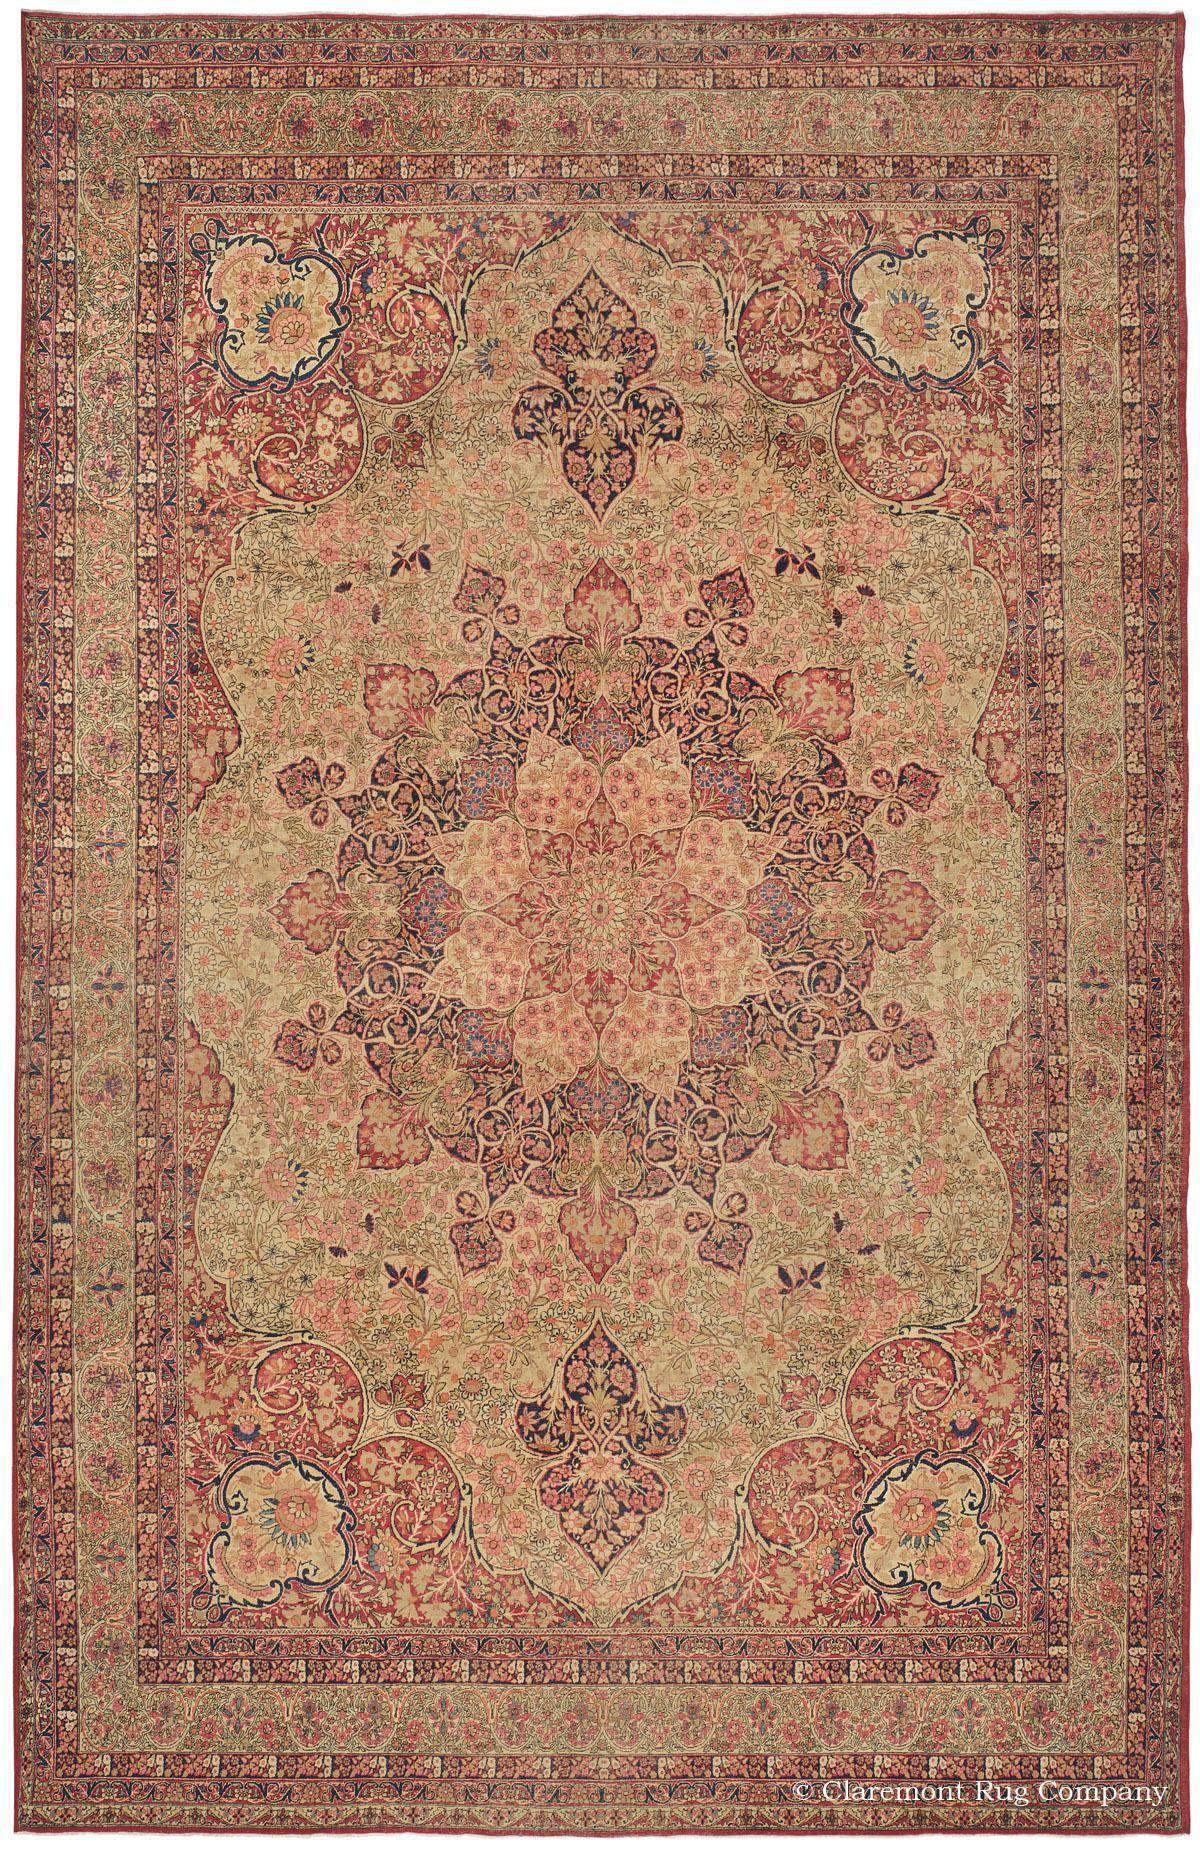 Masterful Laver Kirman Antique Persian Carpet Antique Persian Carpet Persian Carpet Rugs On Carpet